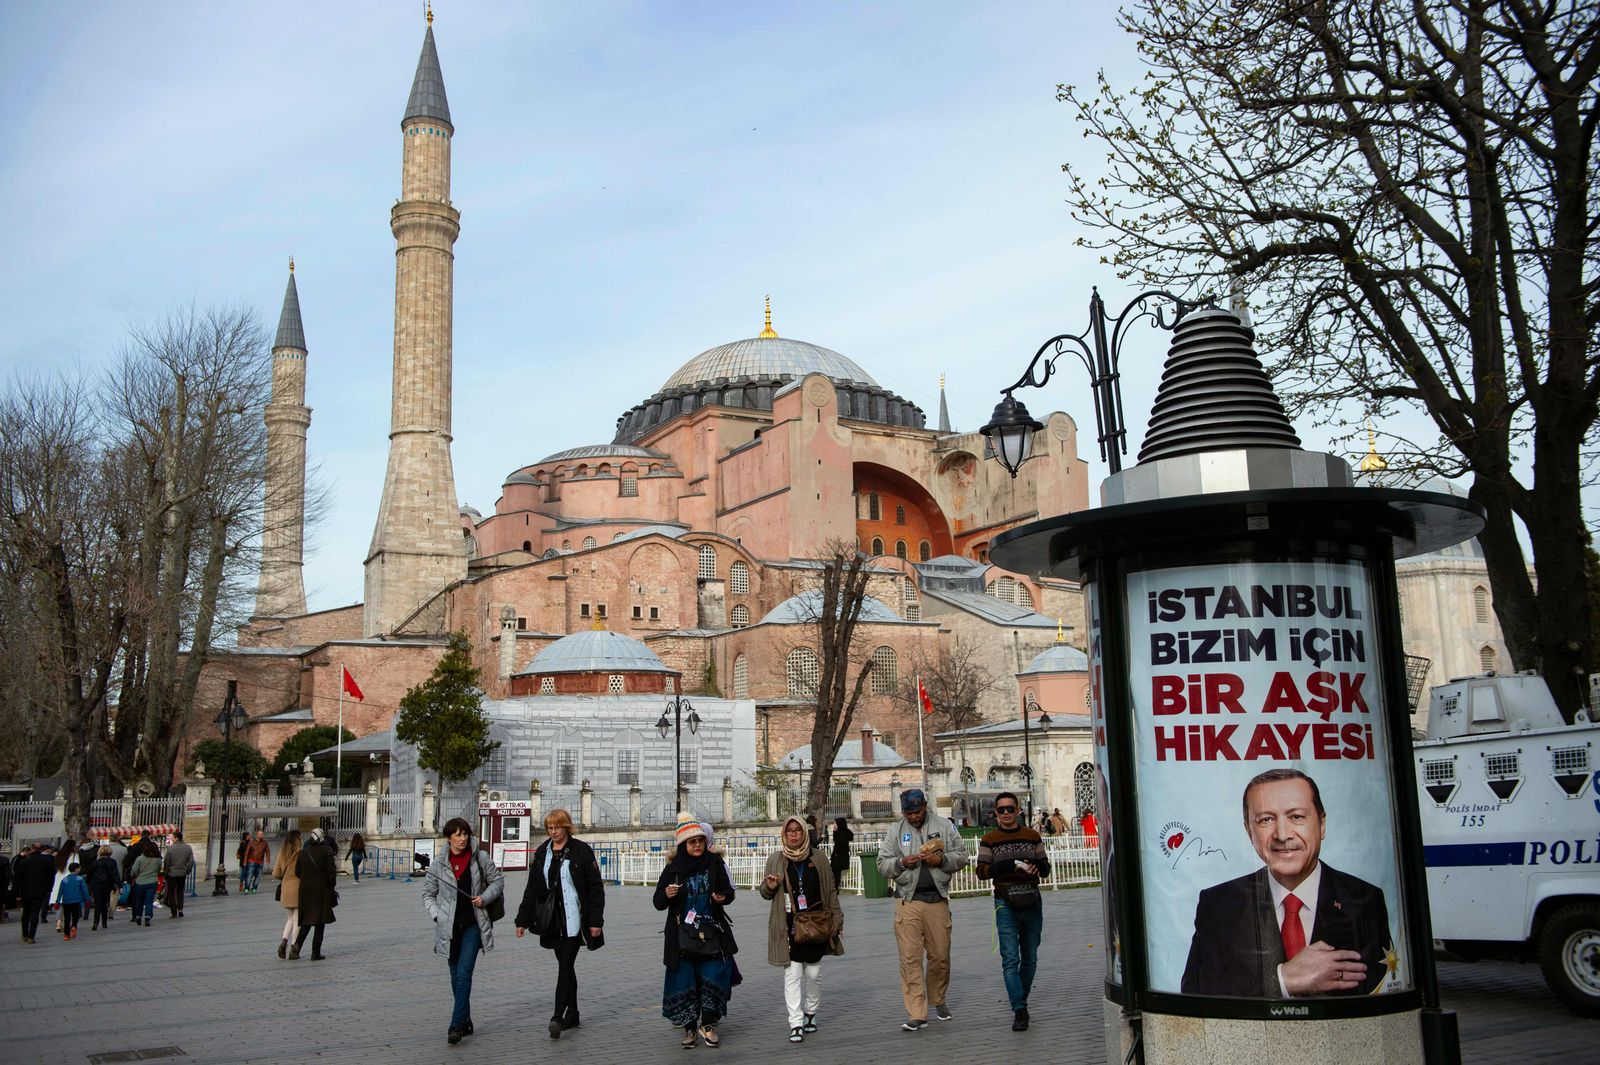 TURKEY-POLITICS-VOTE-RELIGION